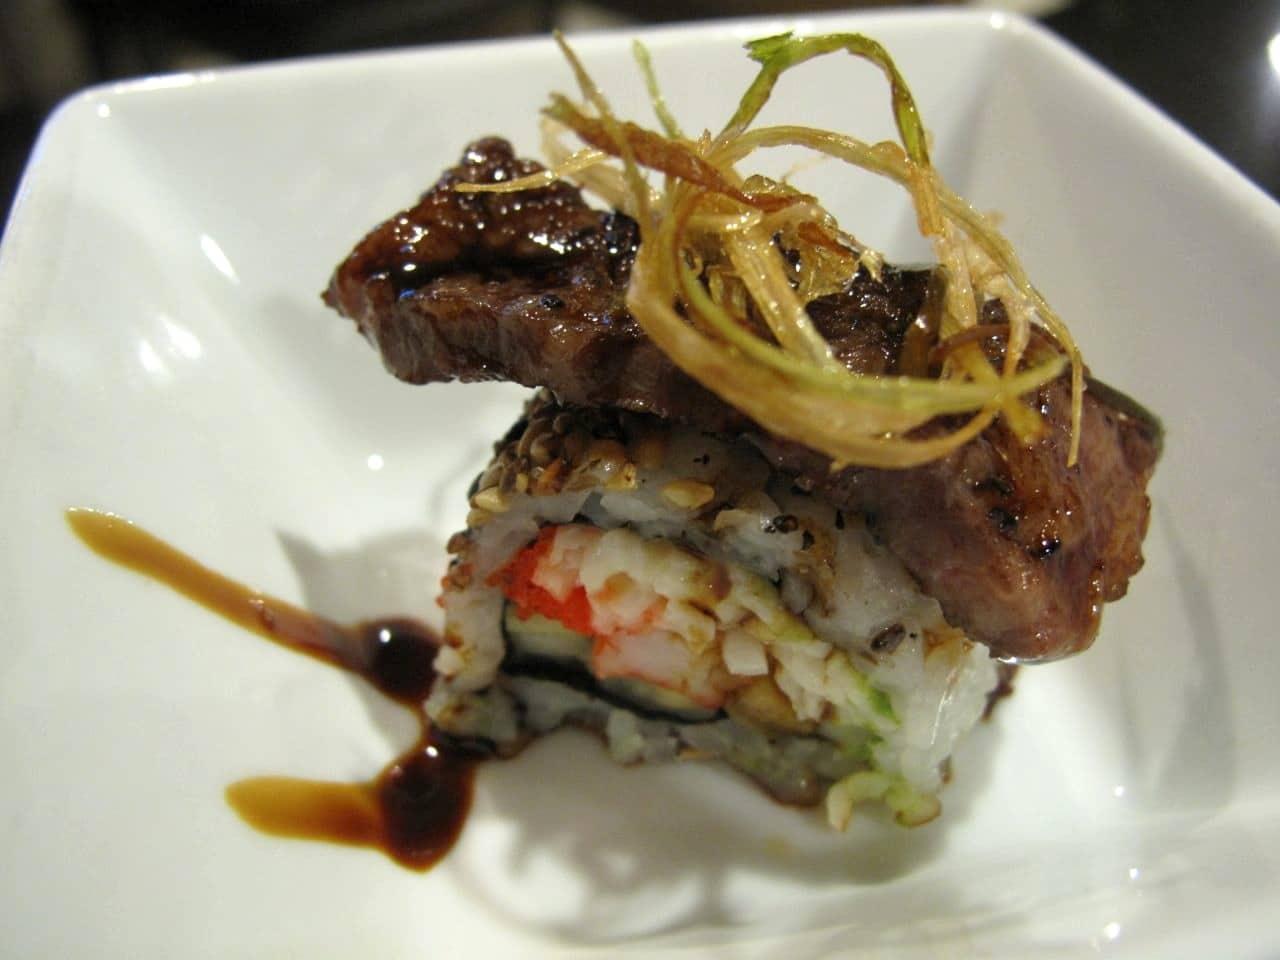 Order from an extensive sushi menu at Arisu Toronto.